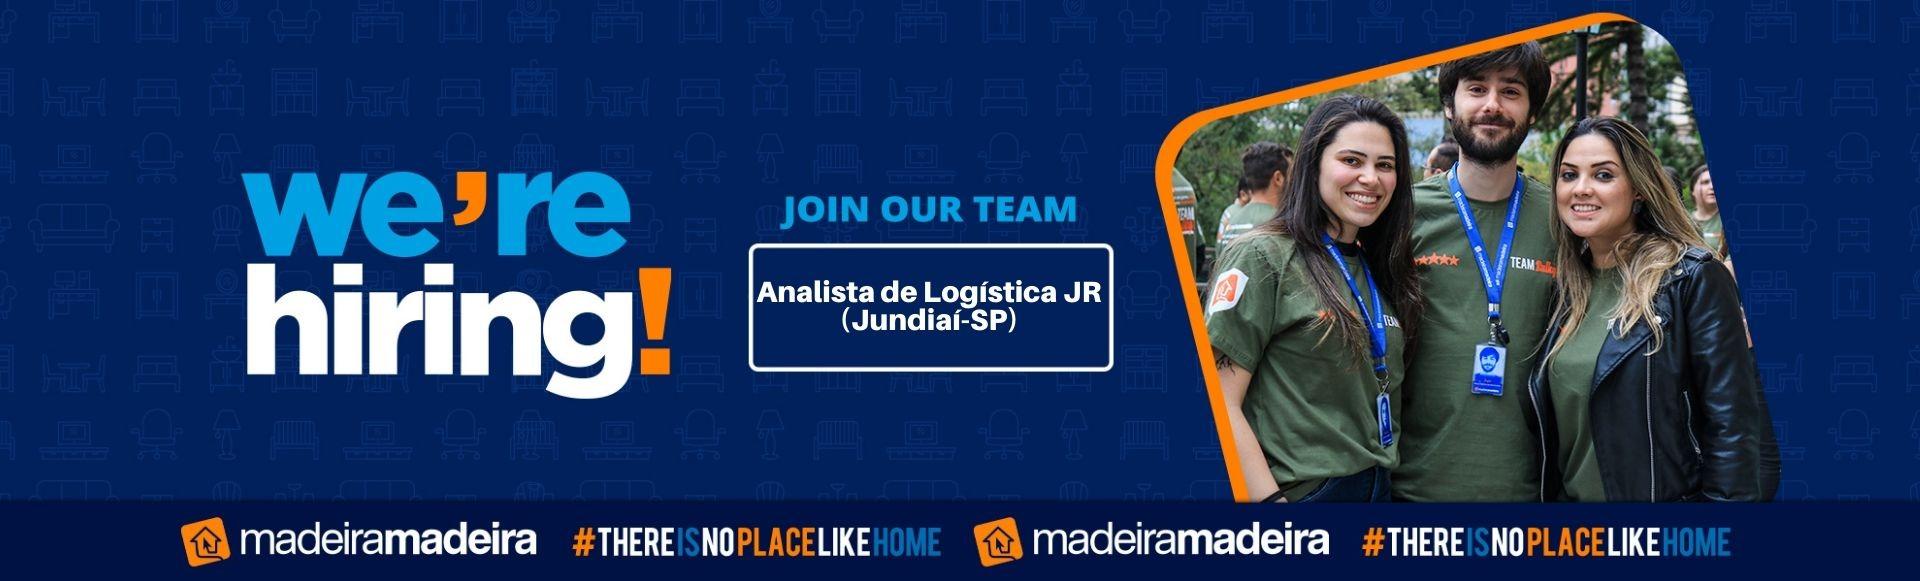 Analista Logística JR. (Jundiaí-SP)